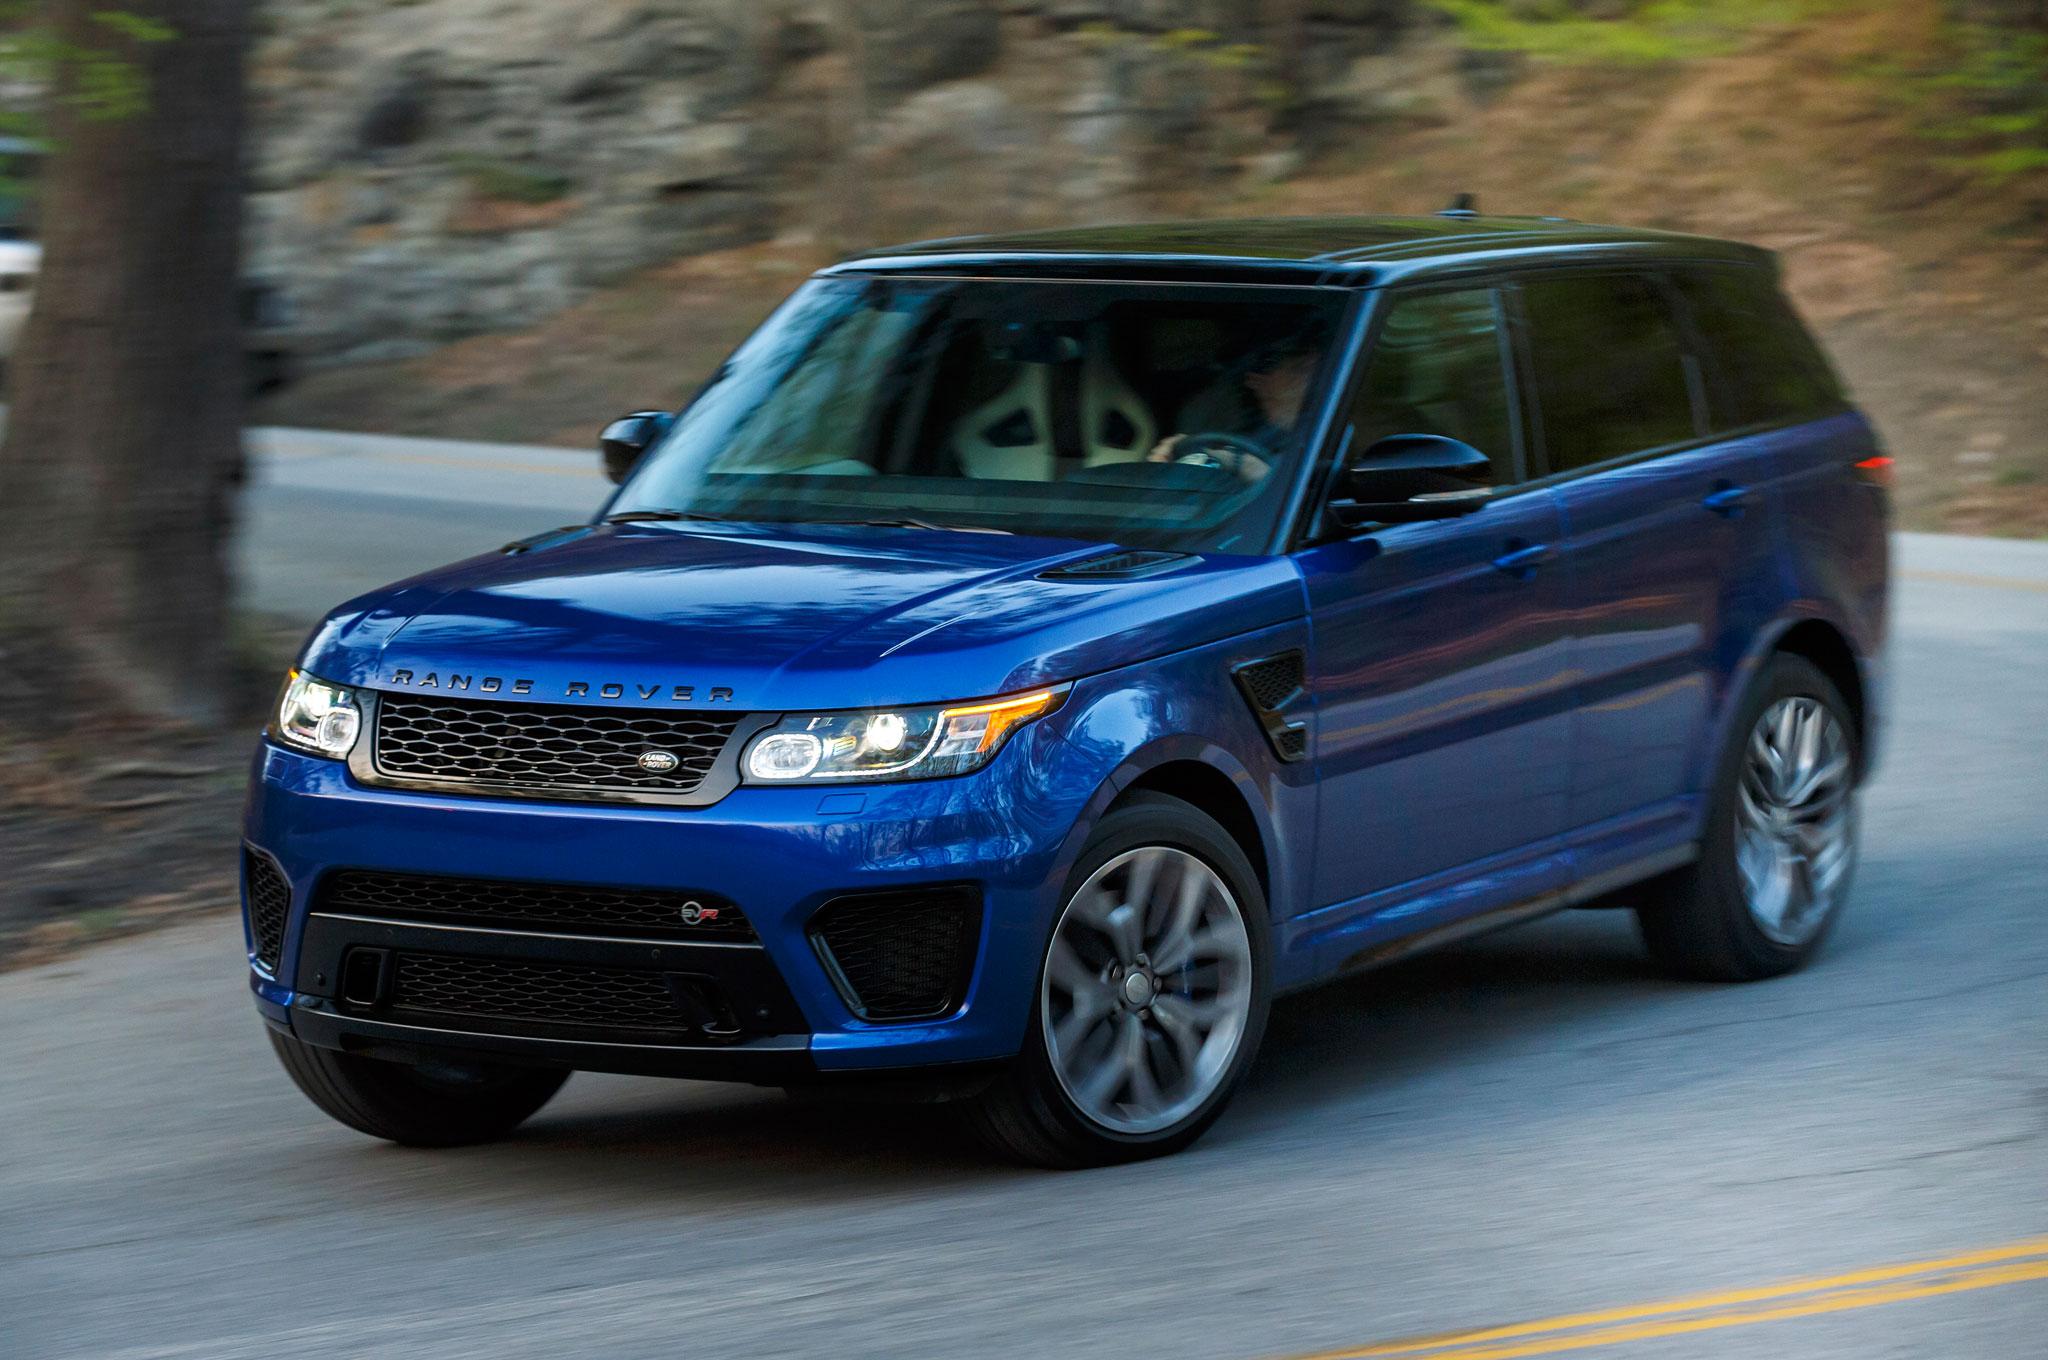 Latest Range Rover Sport >> 2015 Land Rover Range Rover Sport SVR Review | Automobile Magazine